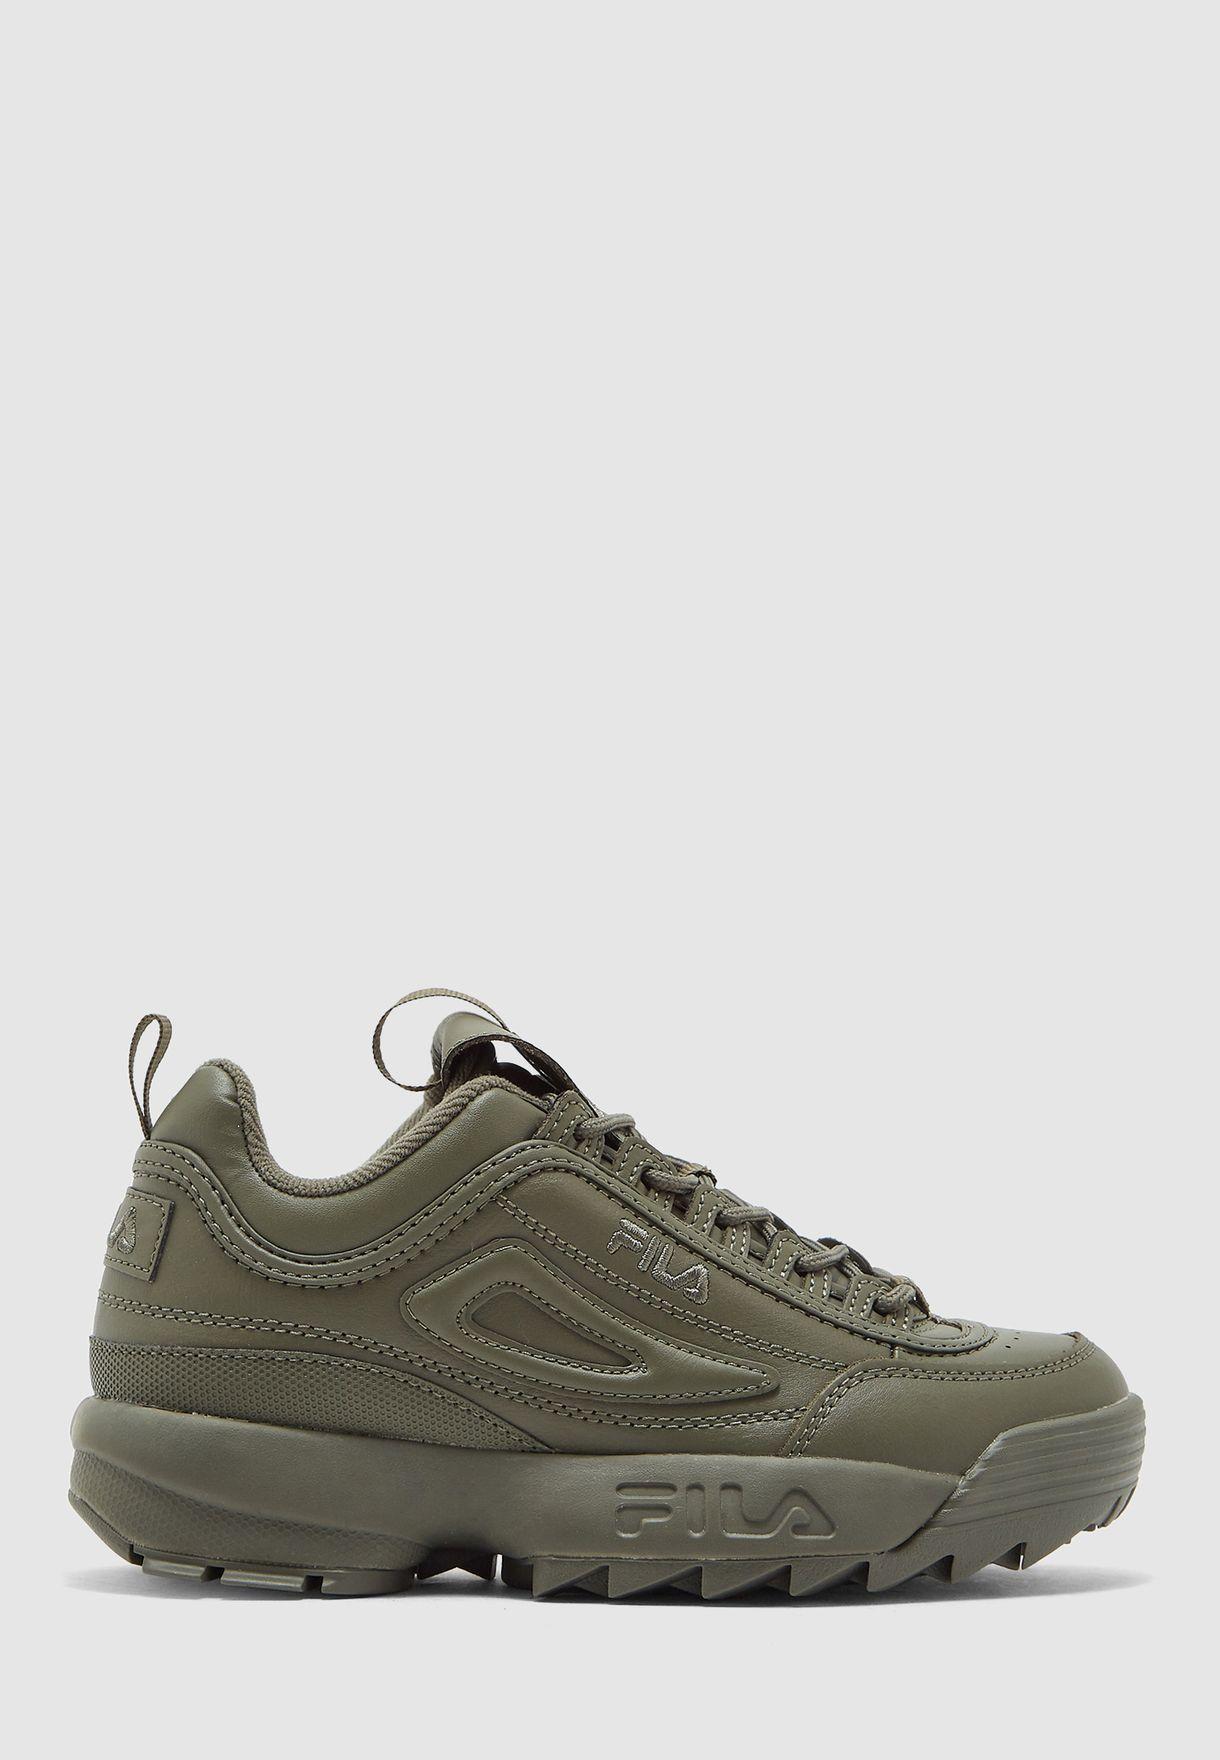 fila shoes price in uae